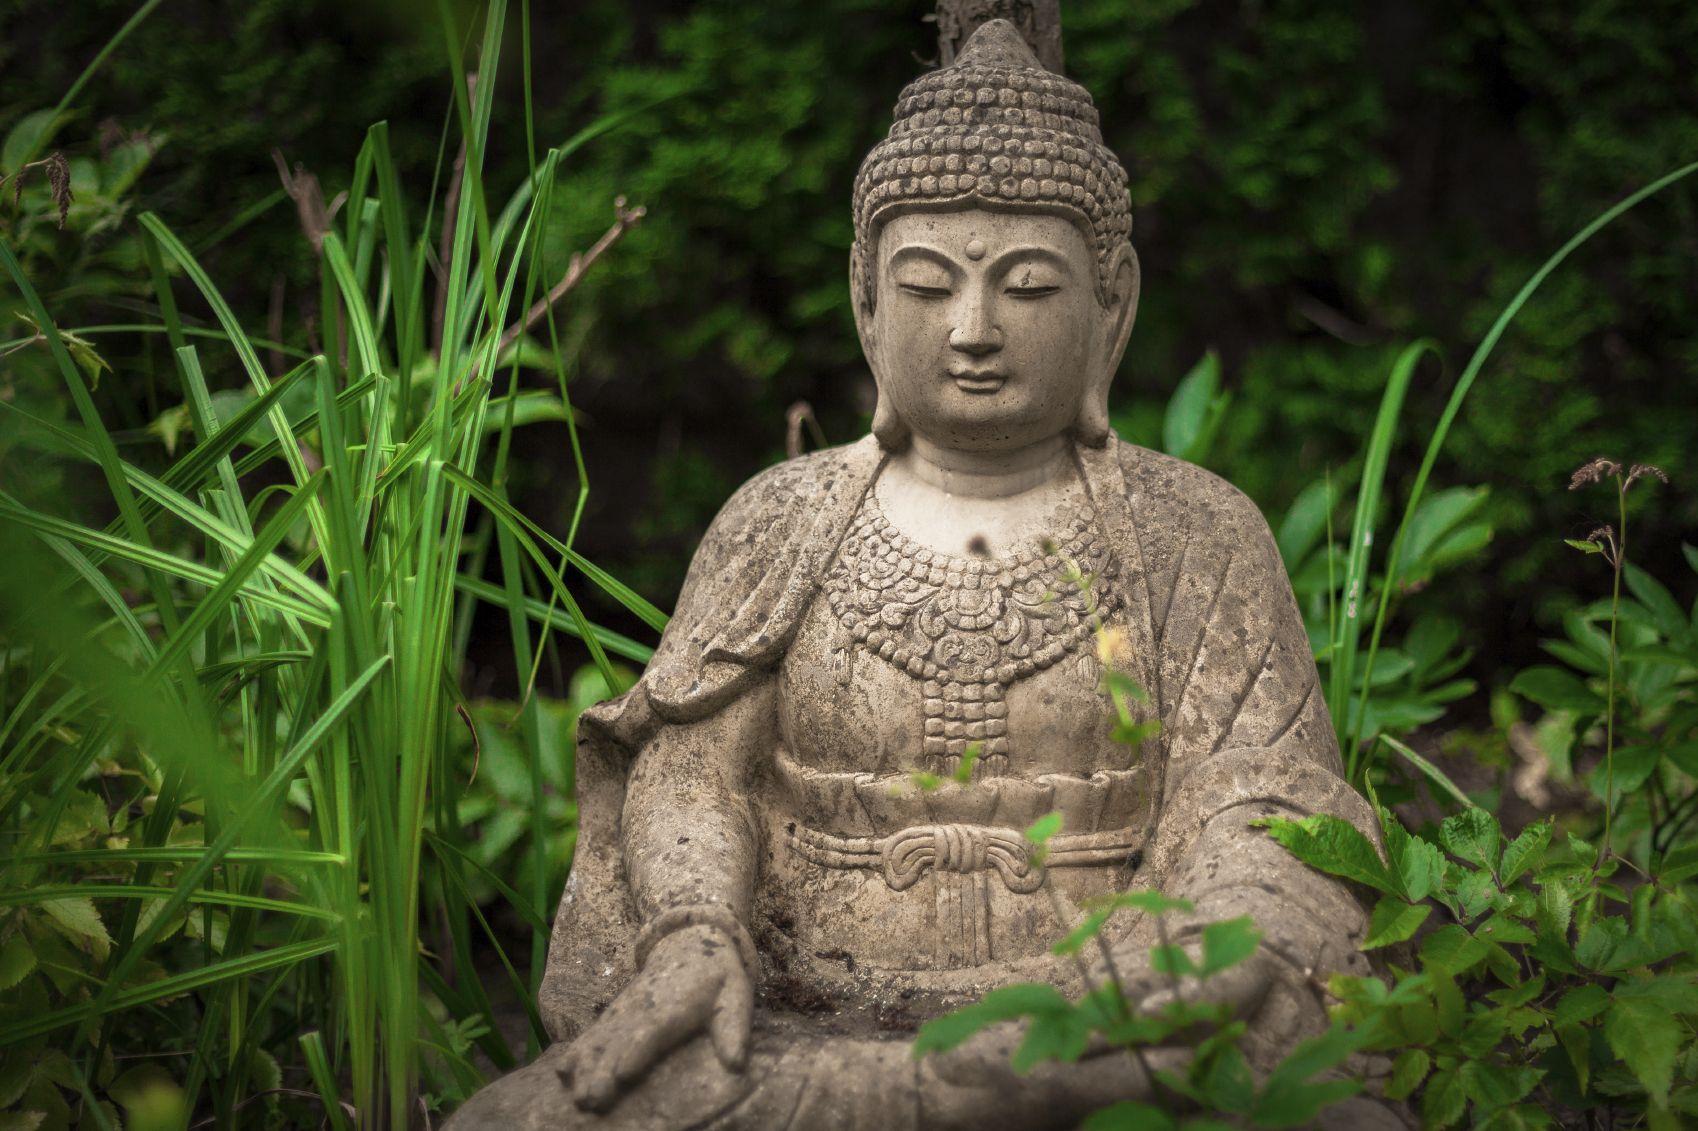 buddhist garden design how to apply buddhist garden elements in the landscape buddhists. Black Bedroom Furniture Sets. Home Design Ideas